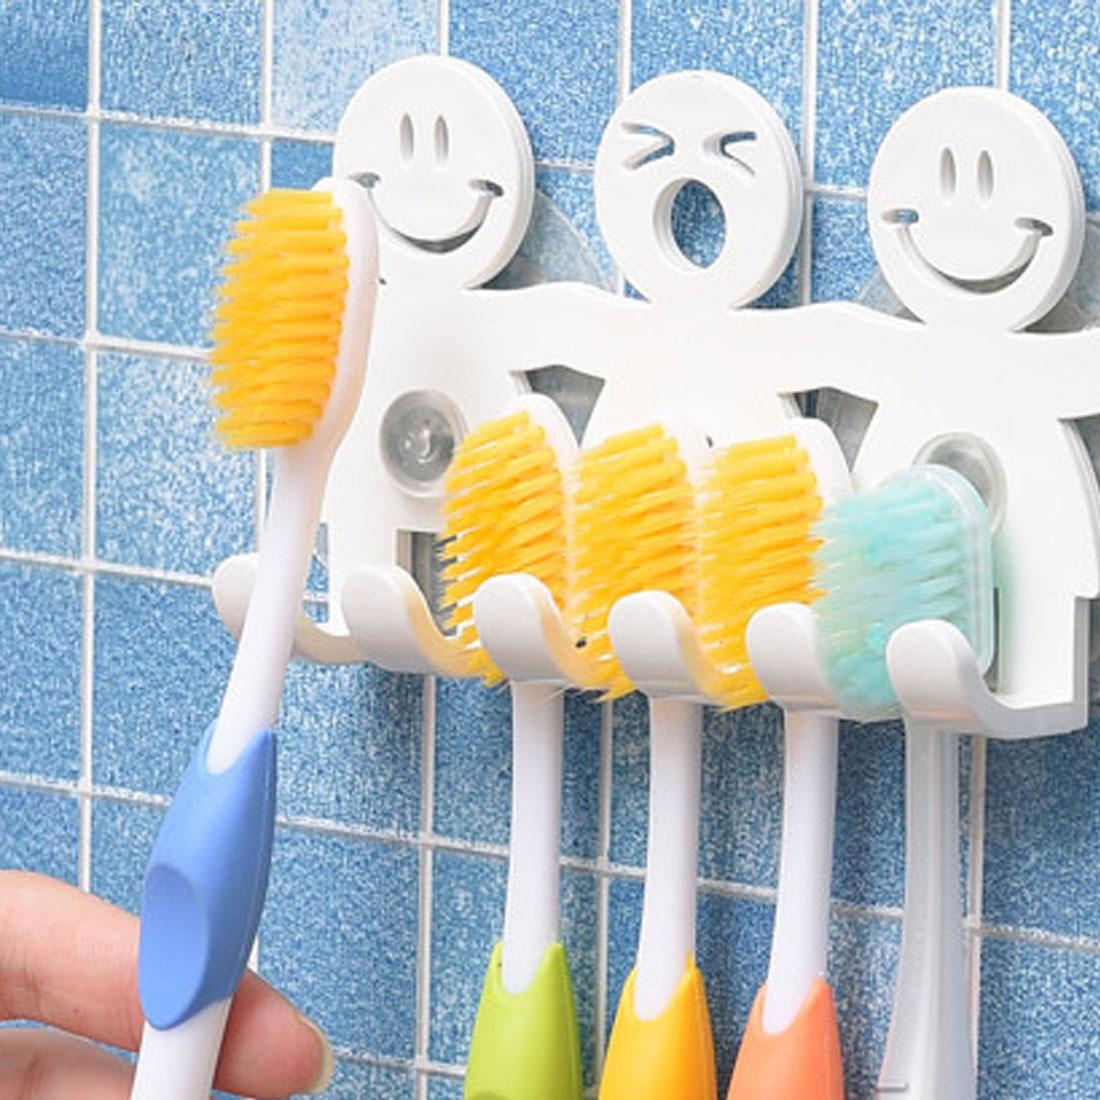 1 stücke Saug Haken 5 Position Zahn Pinsel Halter Badezimmer Sets Nette Lächeln Cartoon Sauger Zahnbürste Halter